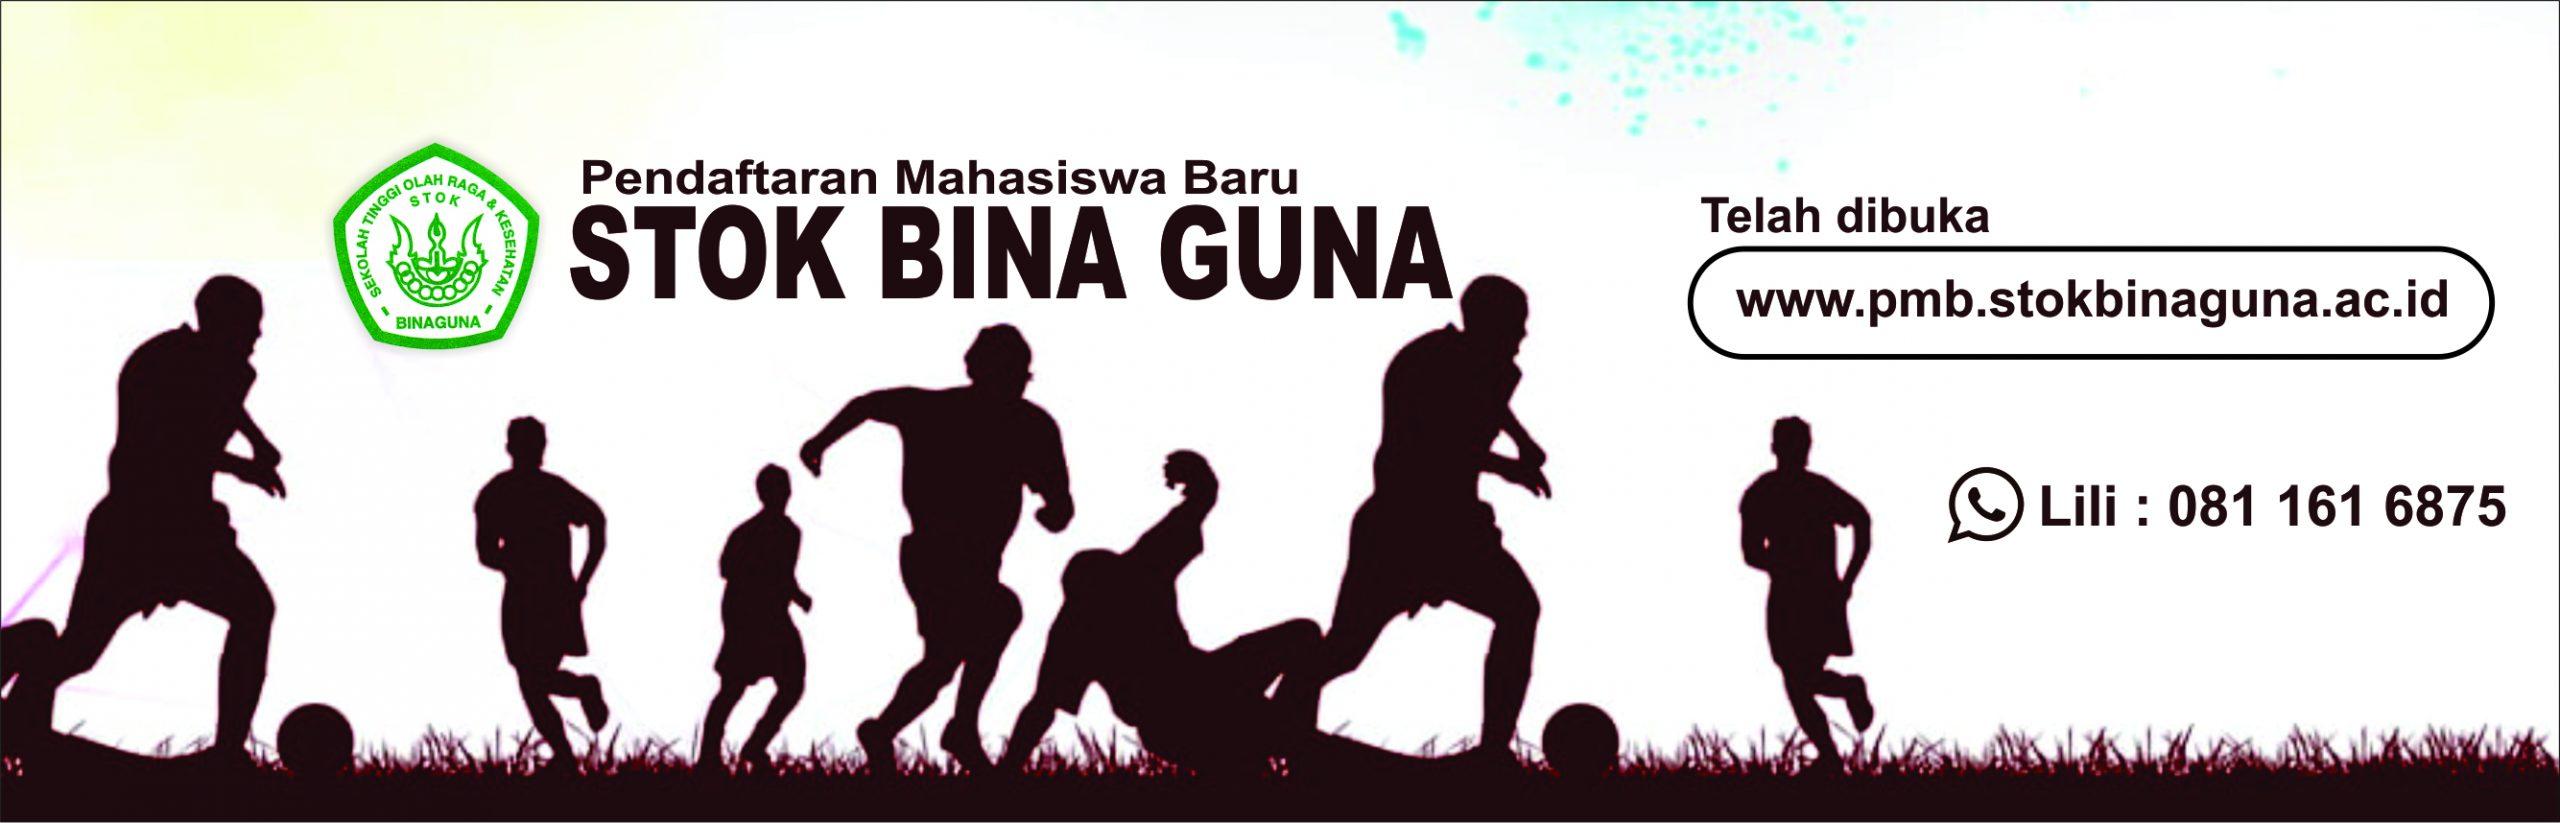 Banner Mahasiswa Baru